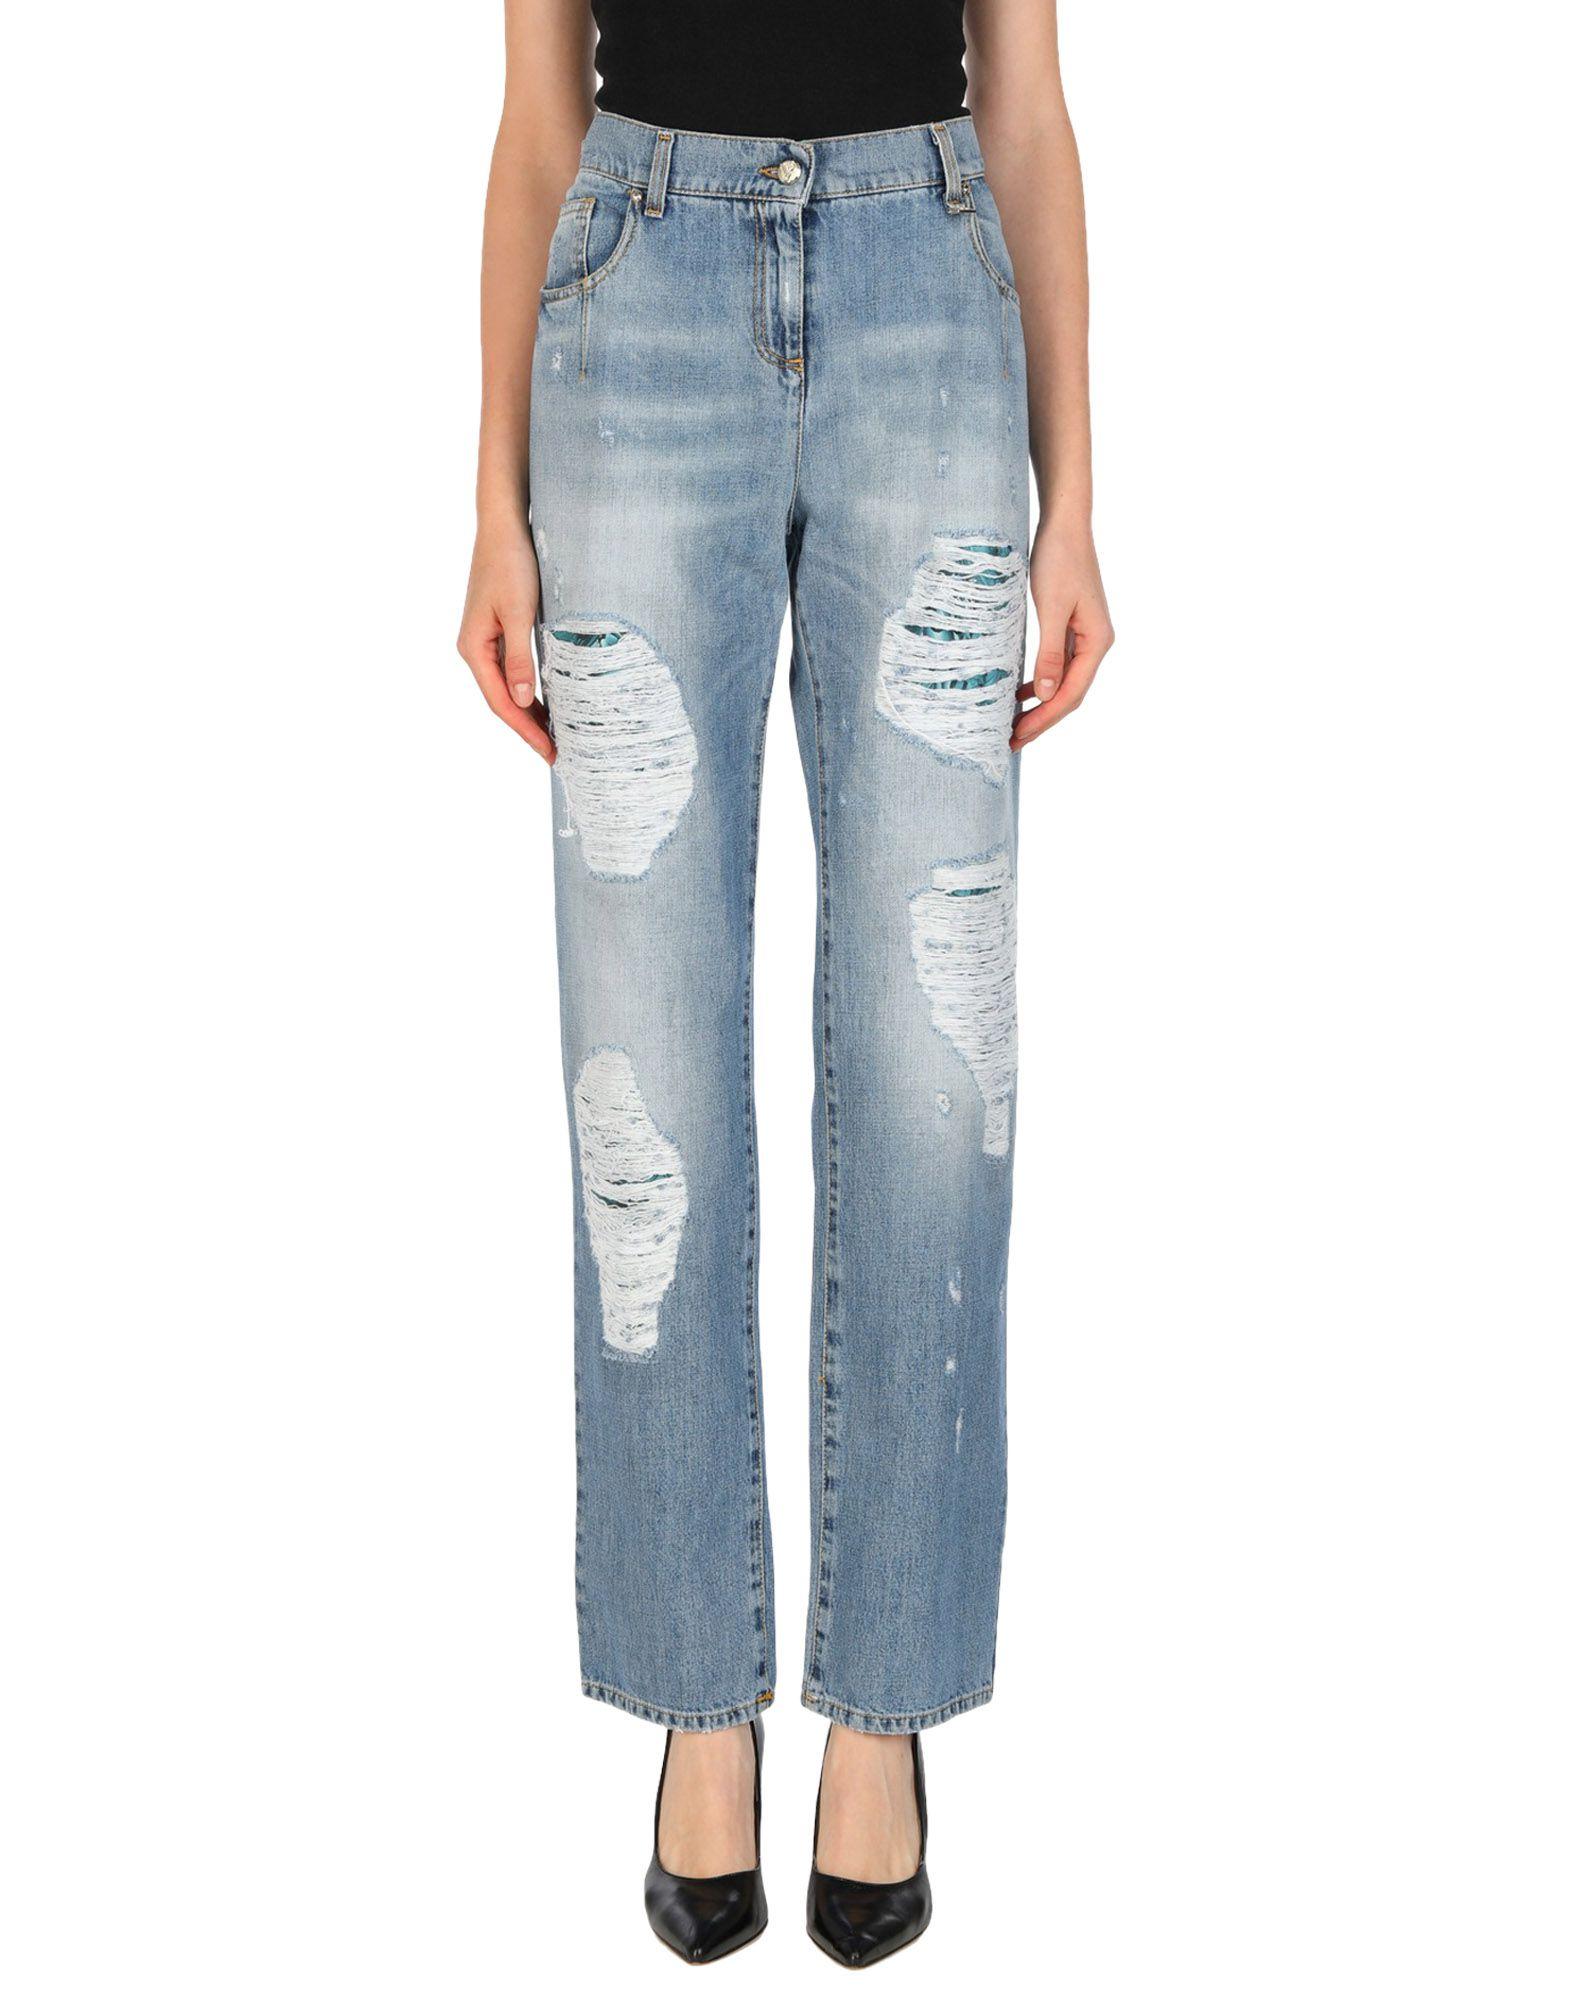 VERSACE JEANS Джинсовые брюки high waist blue cool denim jeans women summer skinny boyfriend hole ripped femme pencil pants fashion female long trousers 40 f